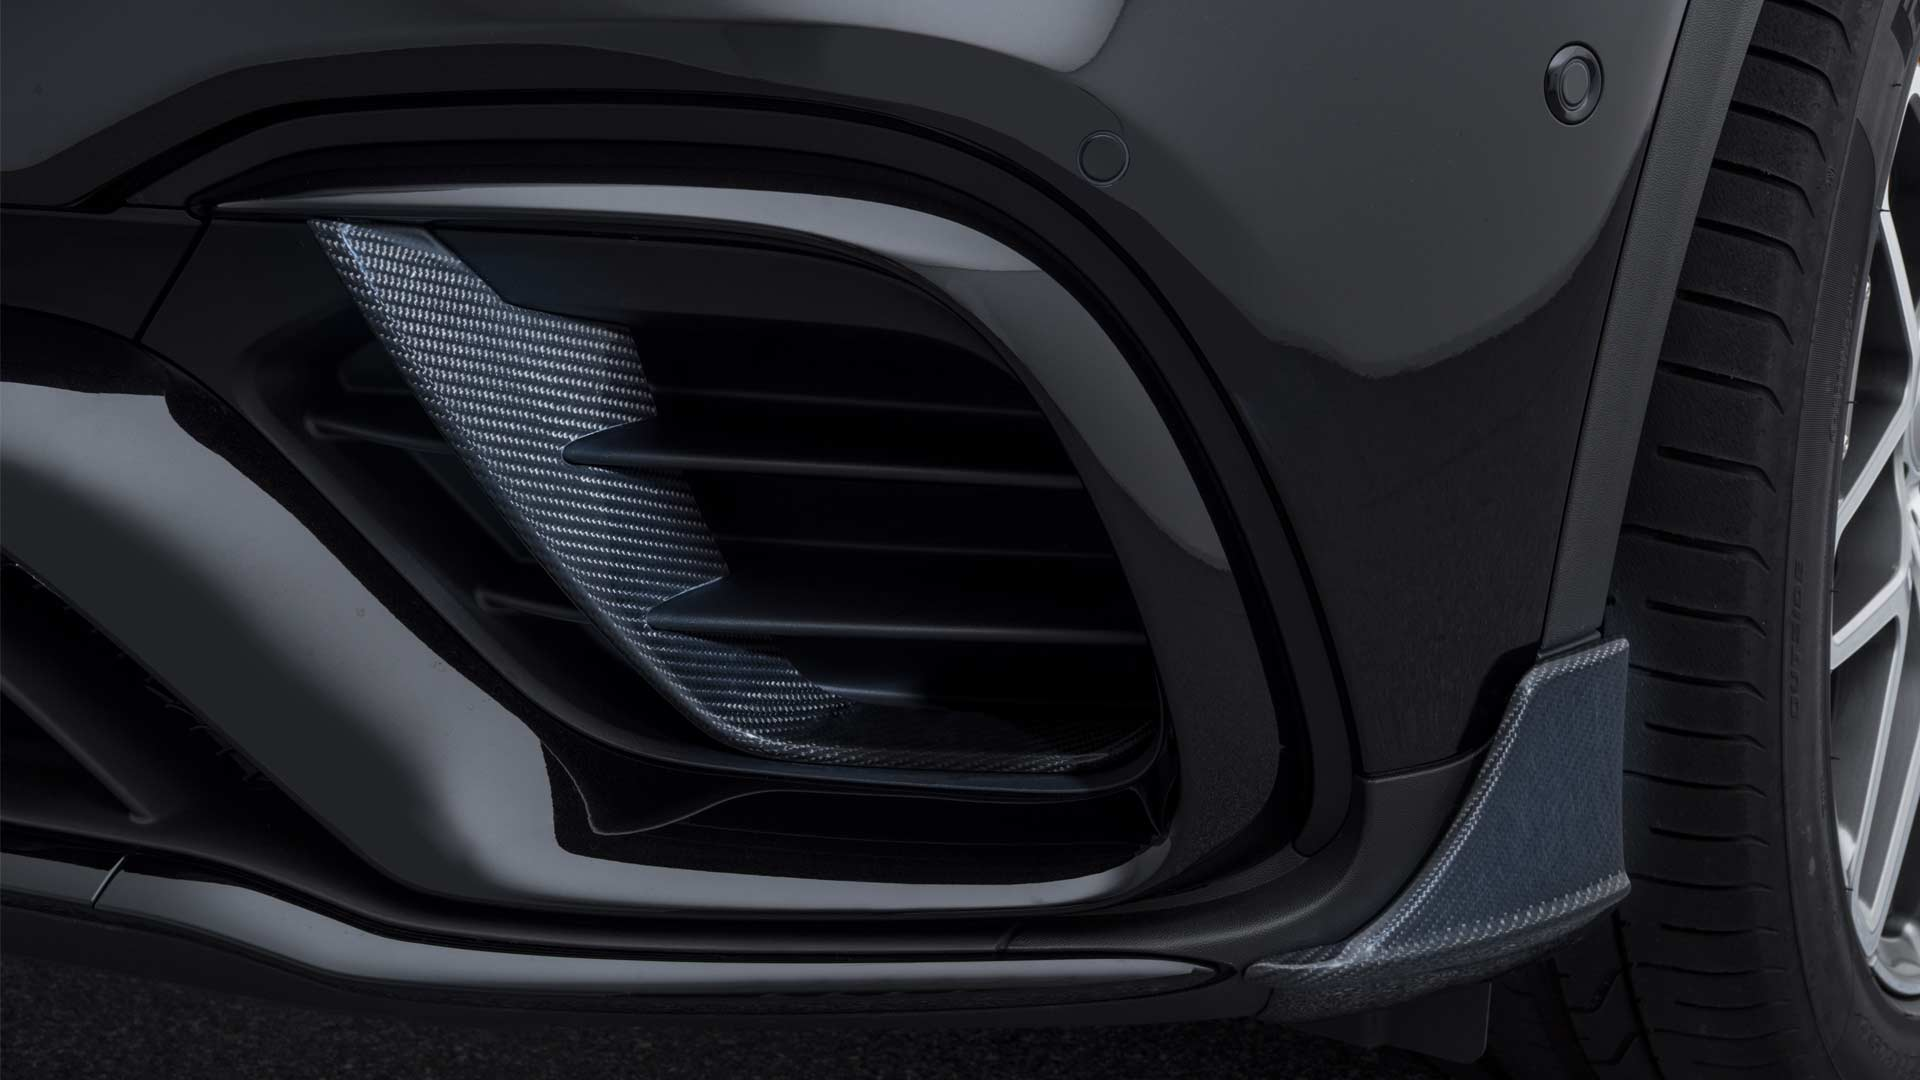 Mercedes-AMG-GLC-63-S-Brabus-600_6